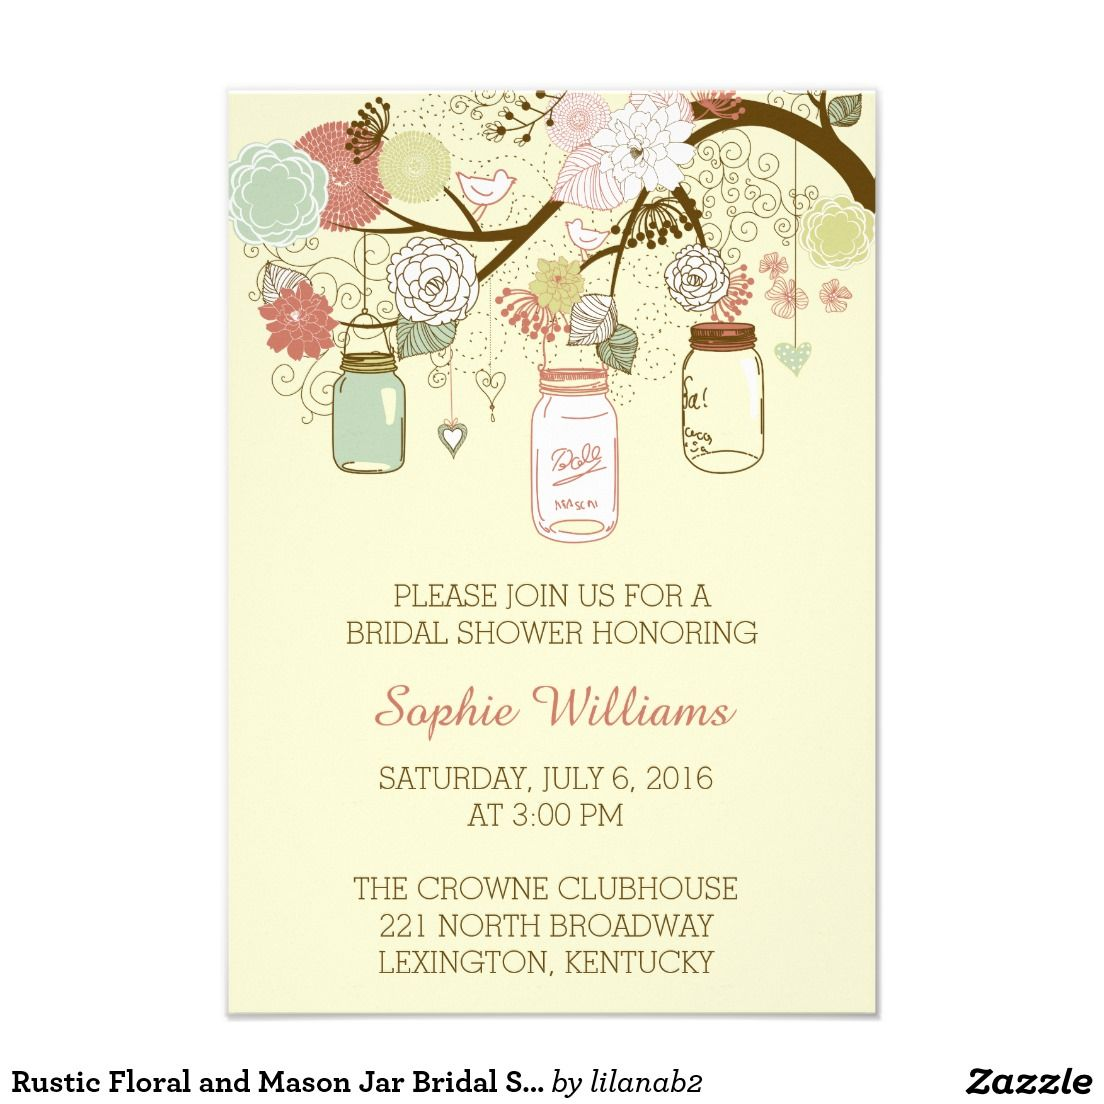 Rustic Floral and Mason Jar Bridal Shower Card @zazzle #zazzle ...